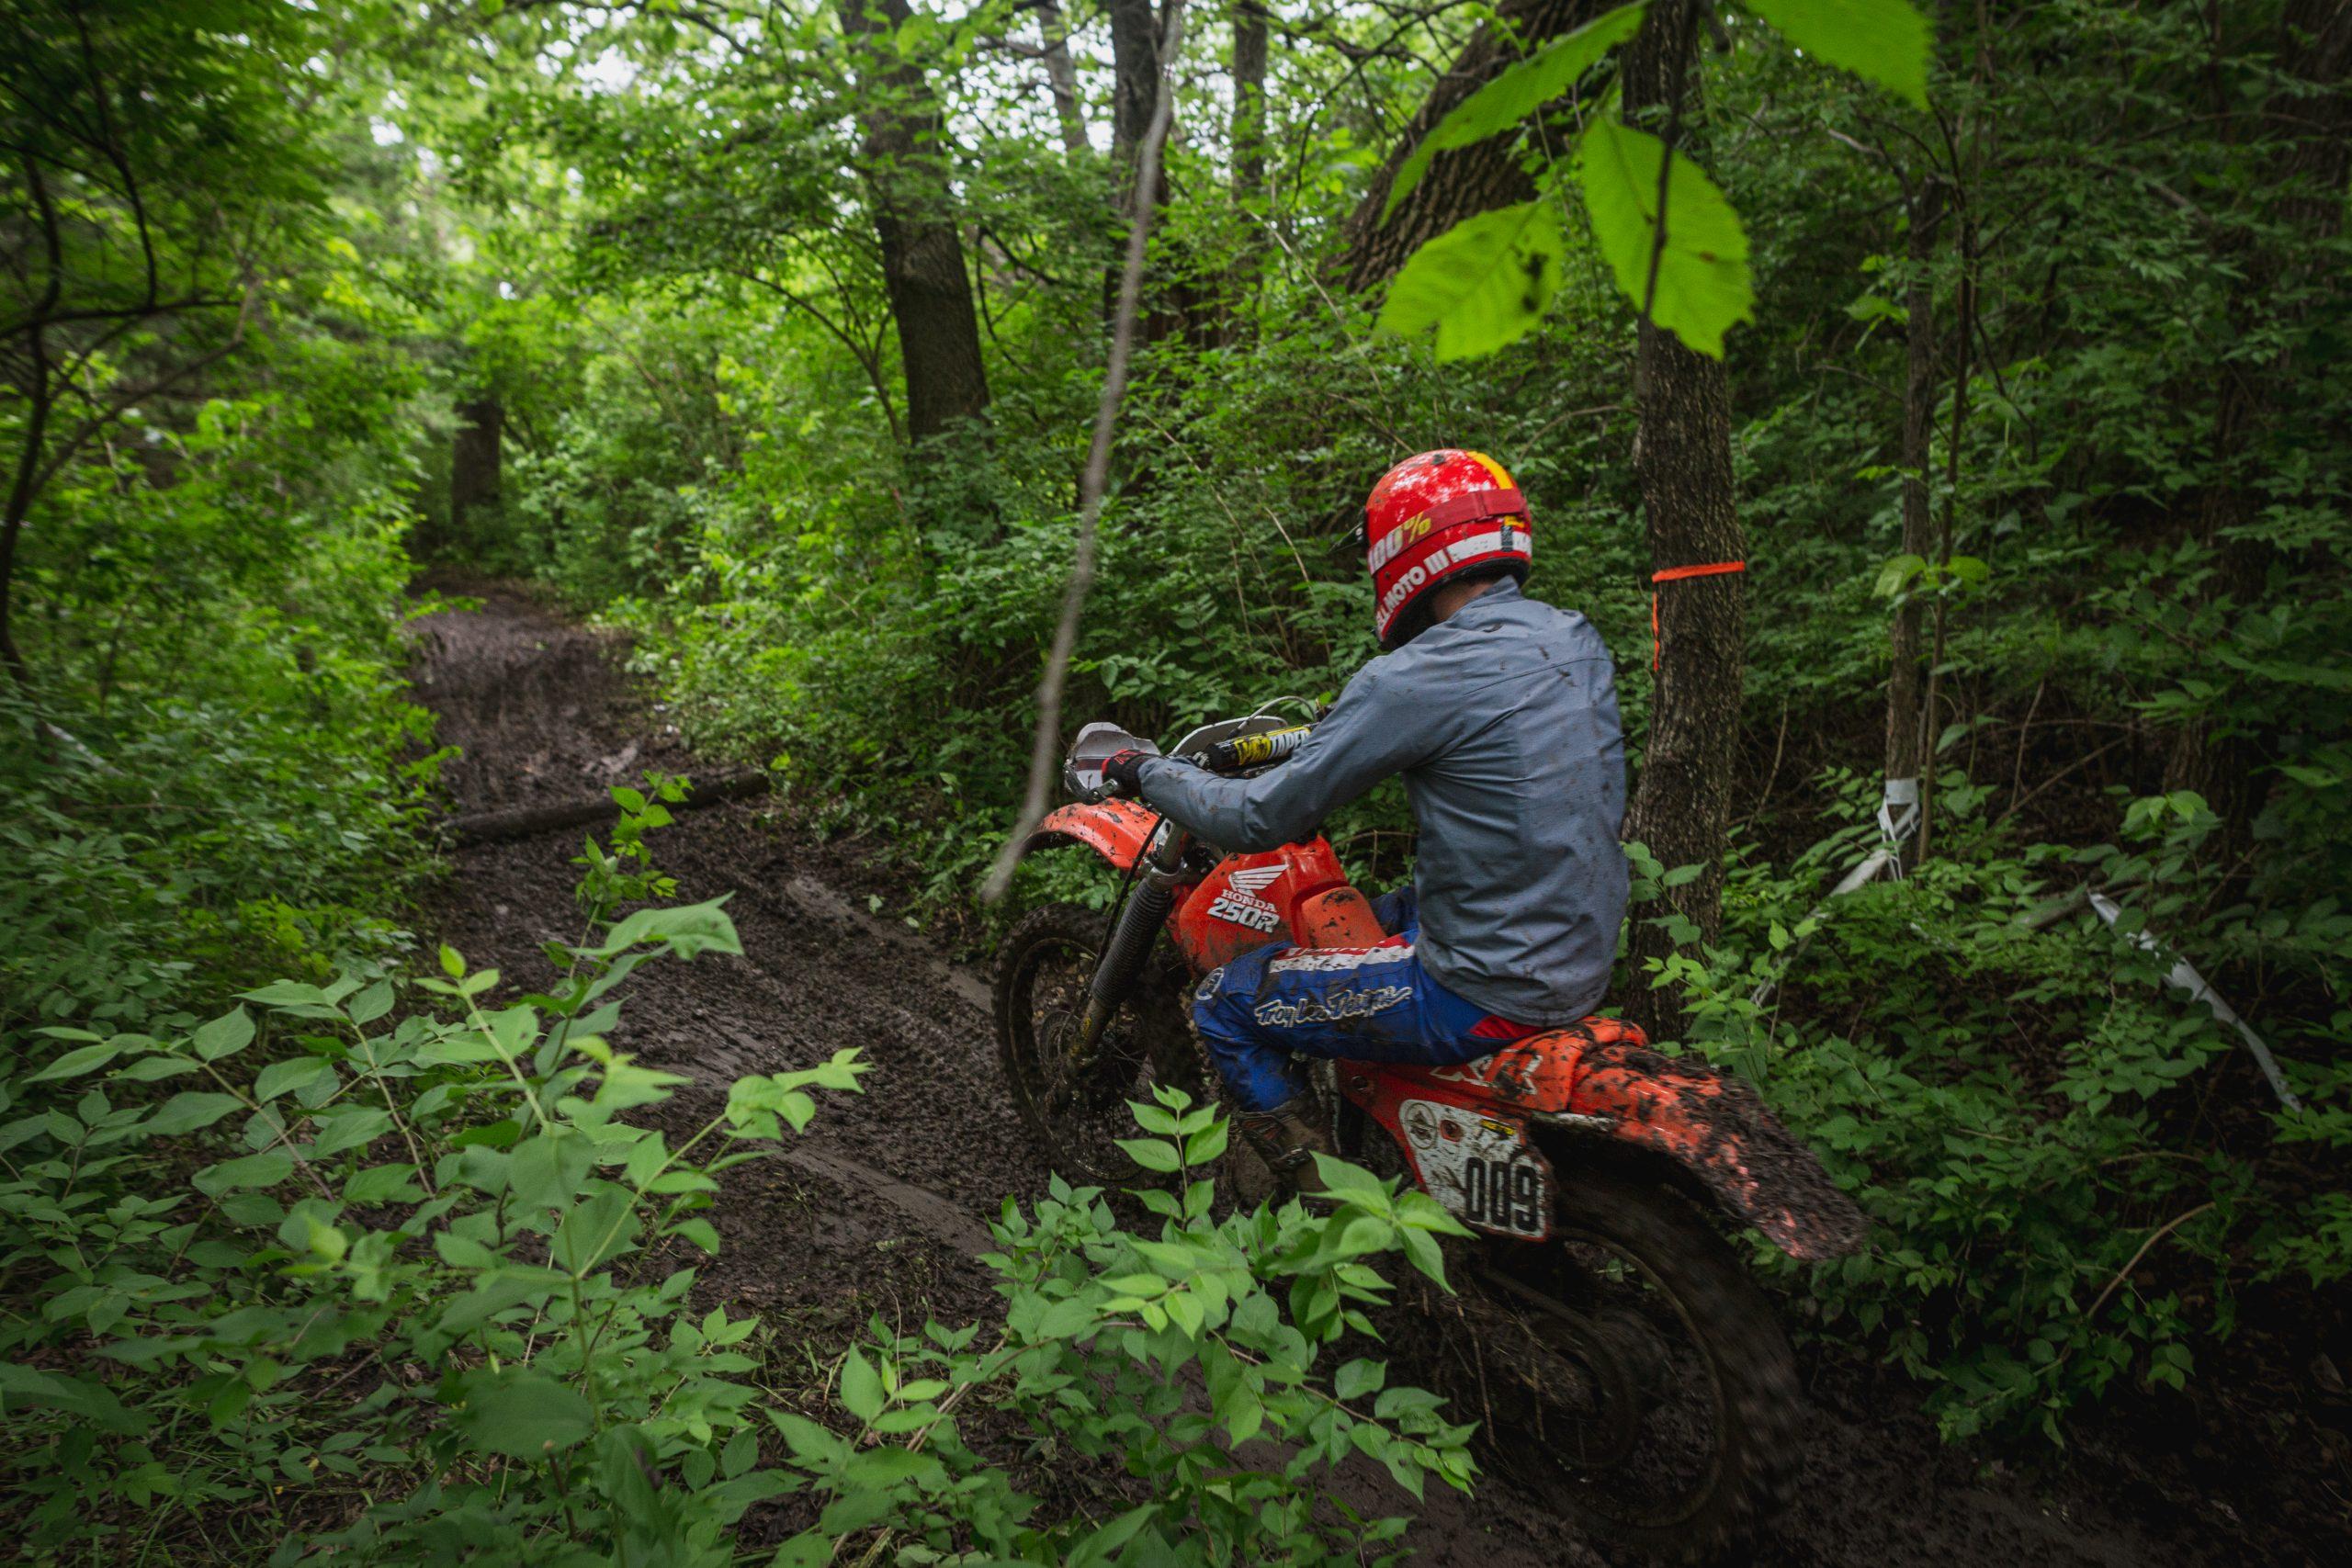 heartland motofest Kyle Smith cross country 2